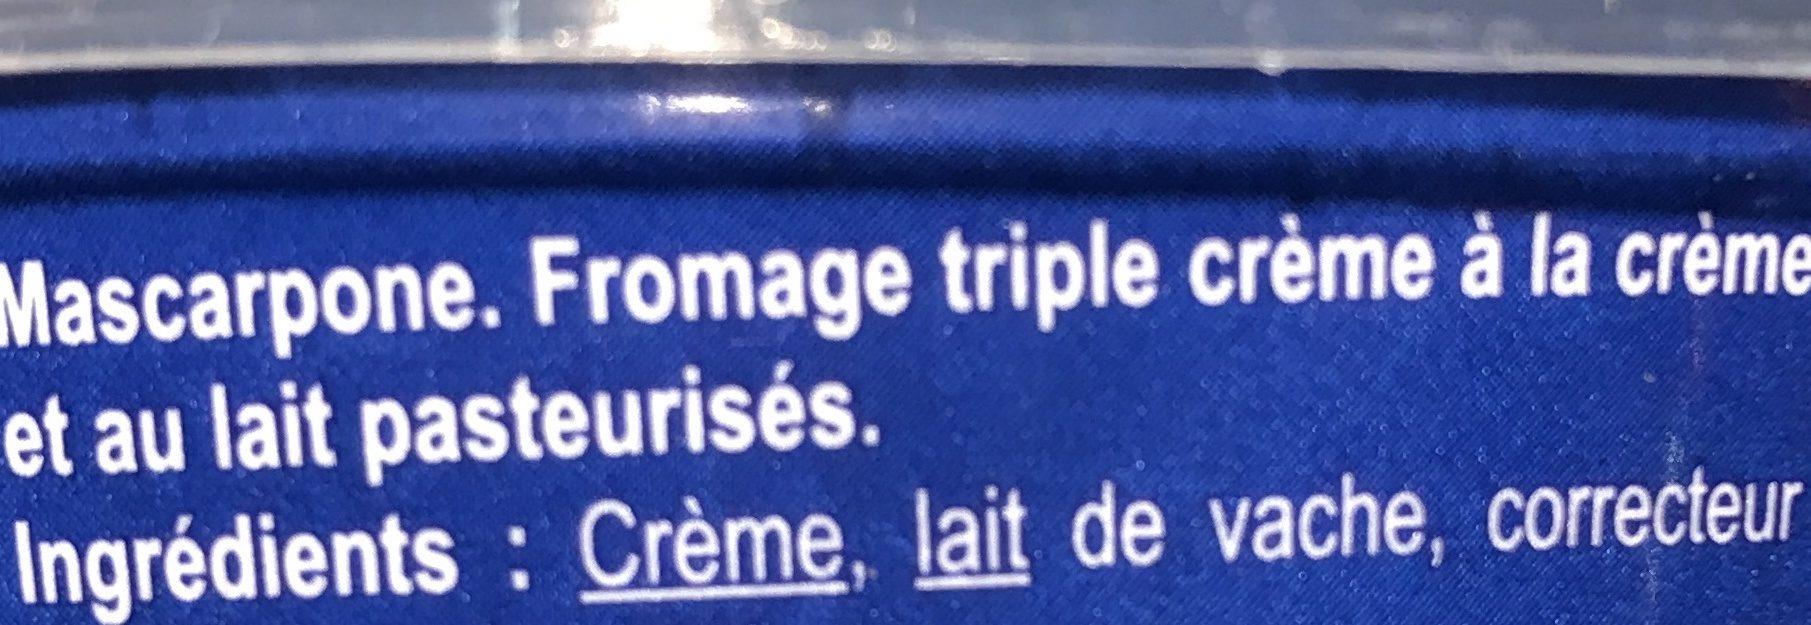 Mascarpone - Ingrédients - fr